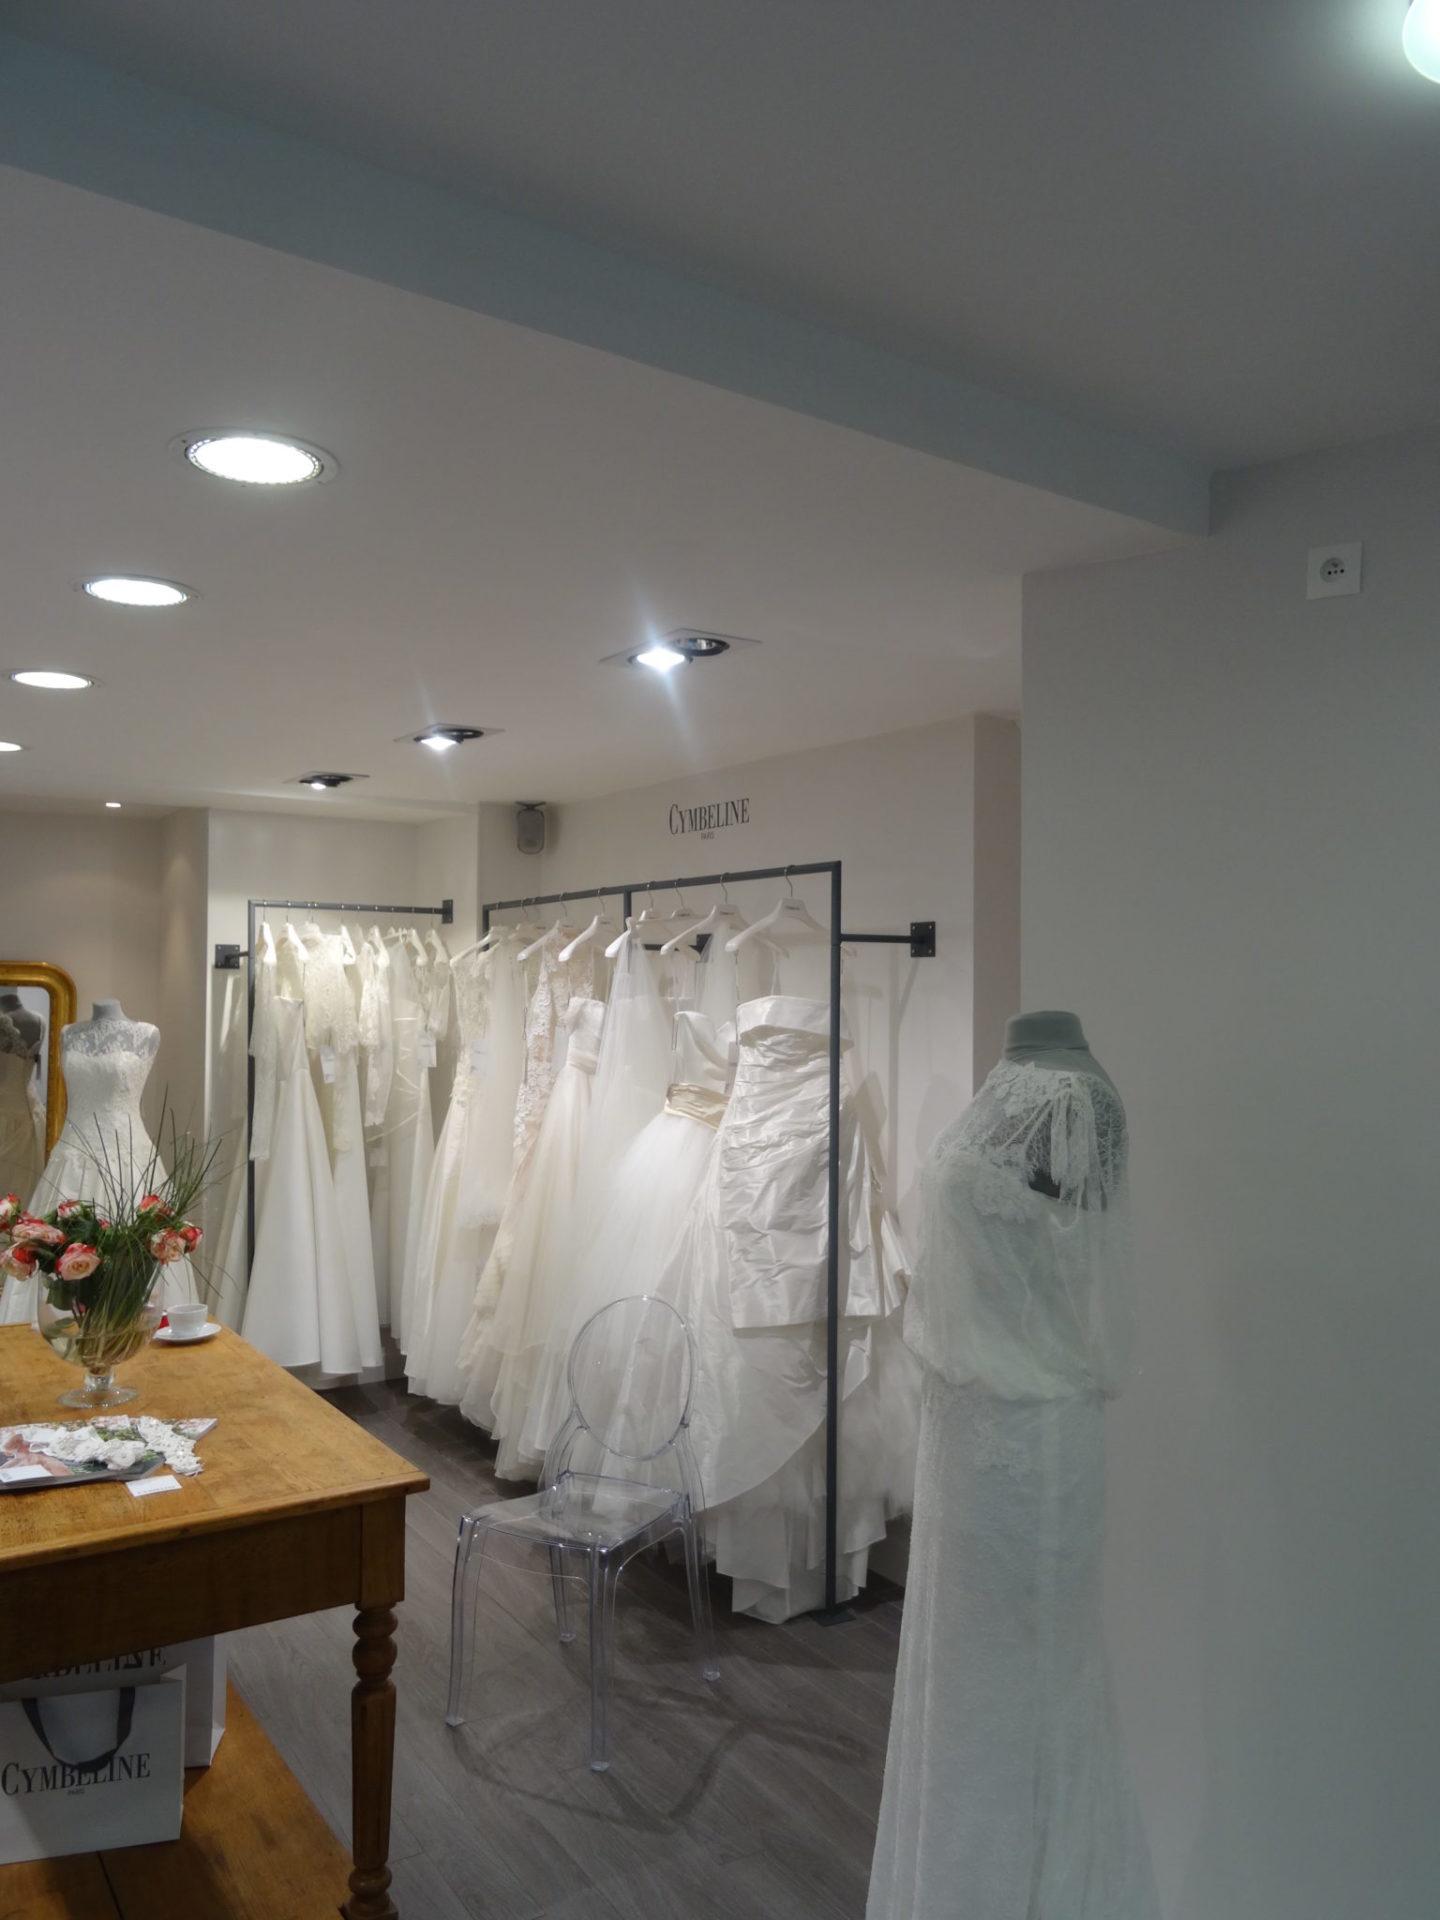 Magasin de robe de mariee fontainebleau